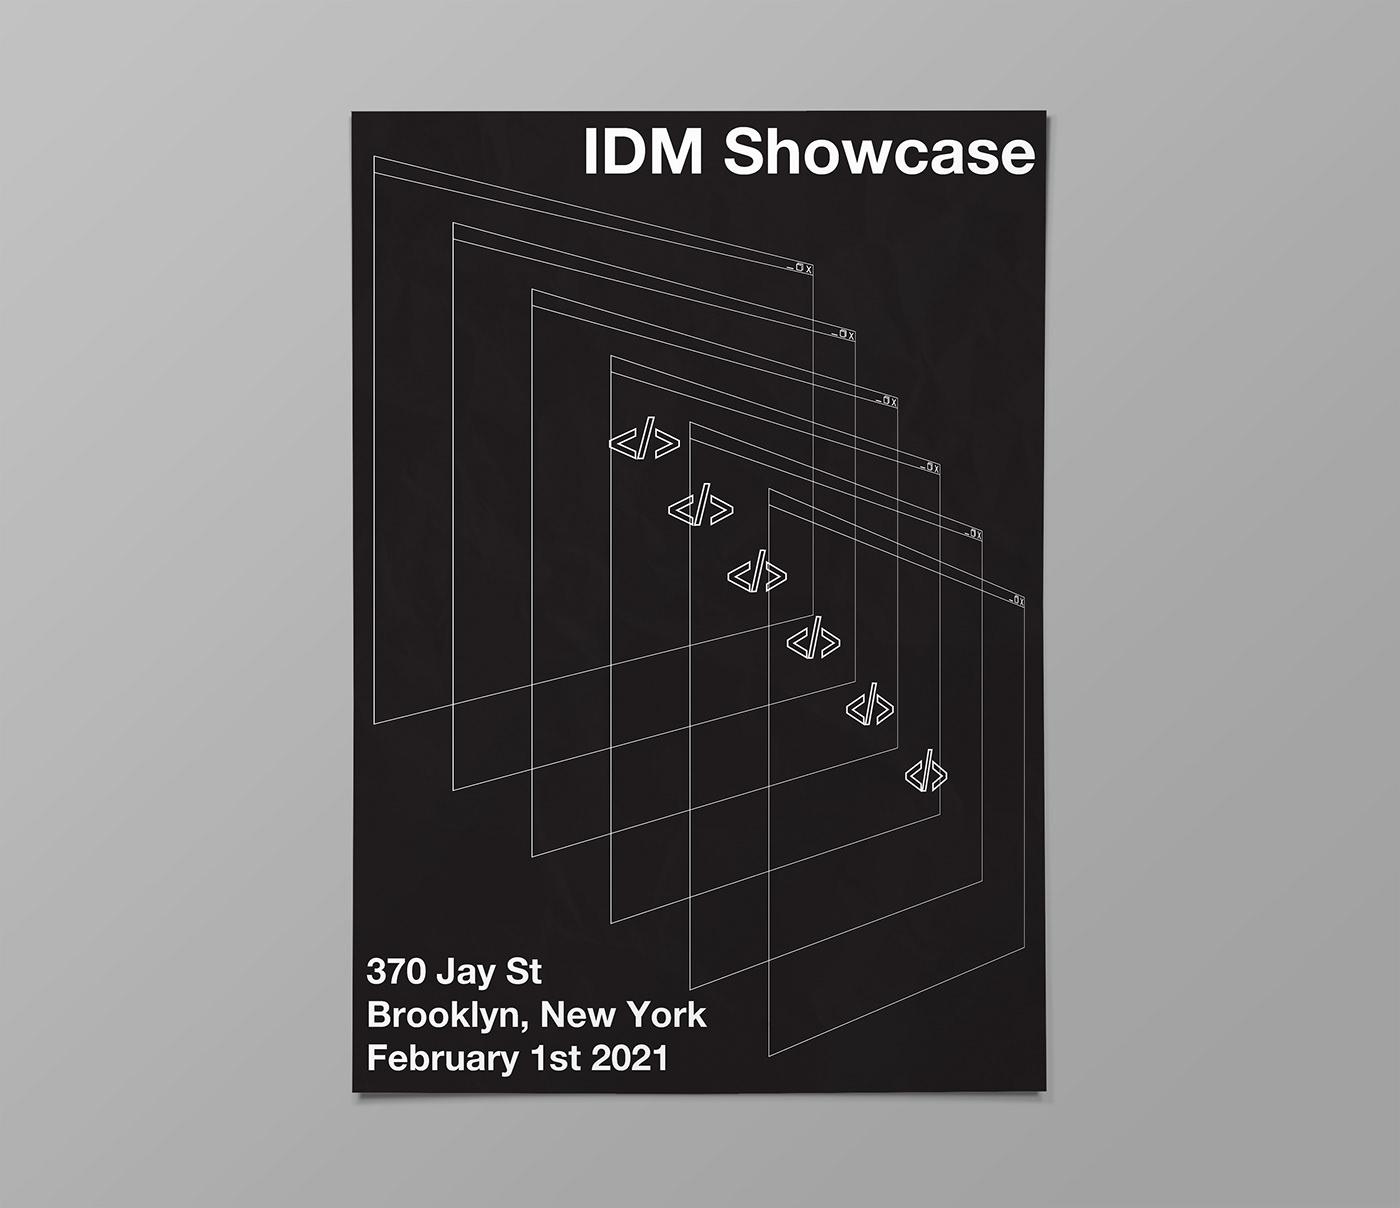 affiche black black and white design fine idm minimal minimalistic poster simple